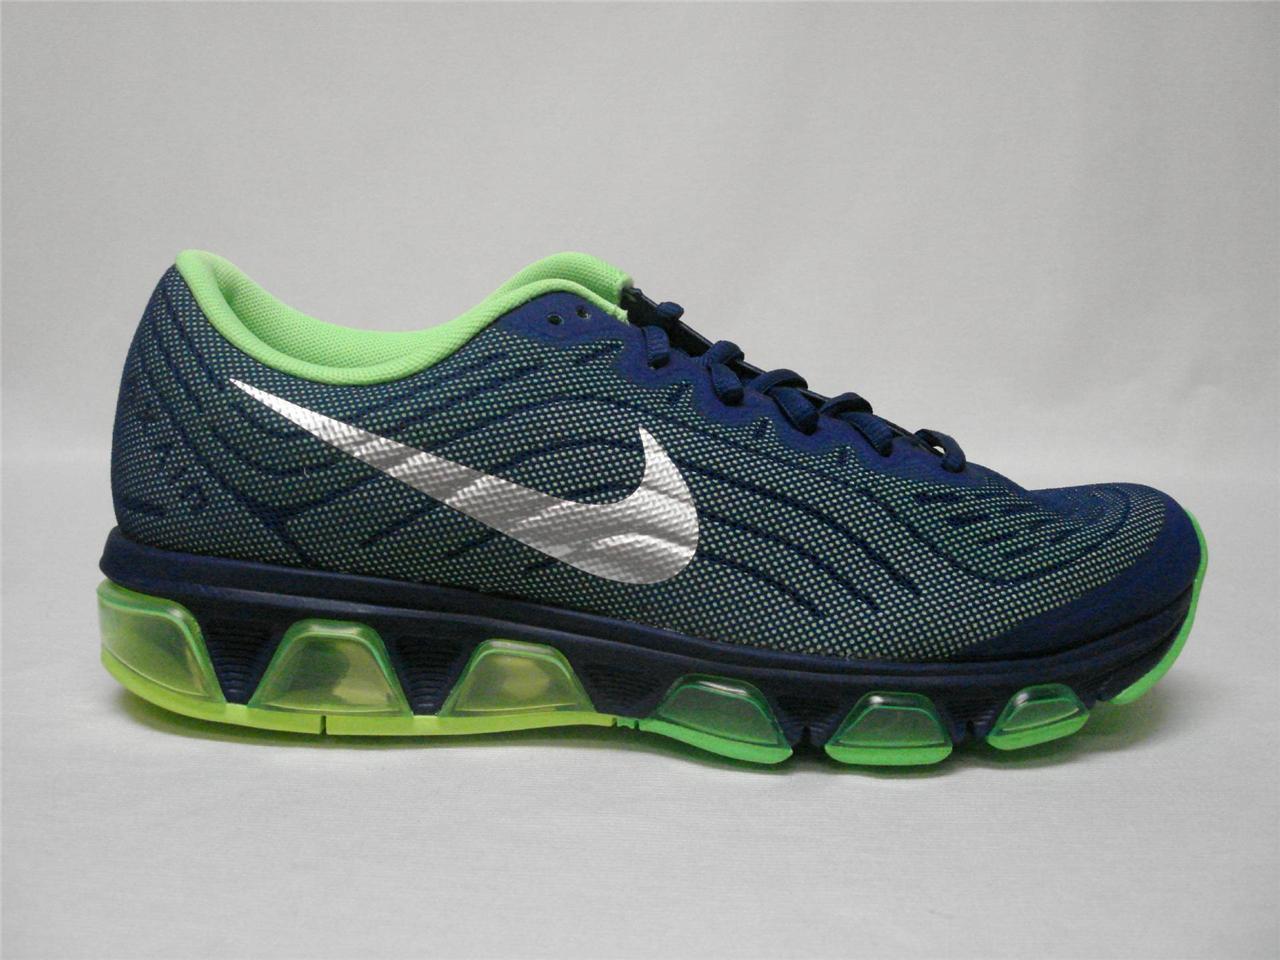 Nuevo EN CAJA NIKE MAX TAILWIND 6 Para hombre Zapatos AIR  8.5 voltios   Zapato impresionante buscando